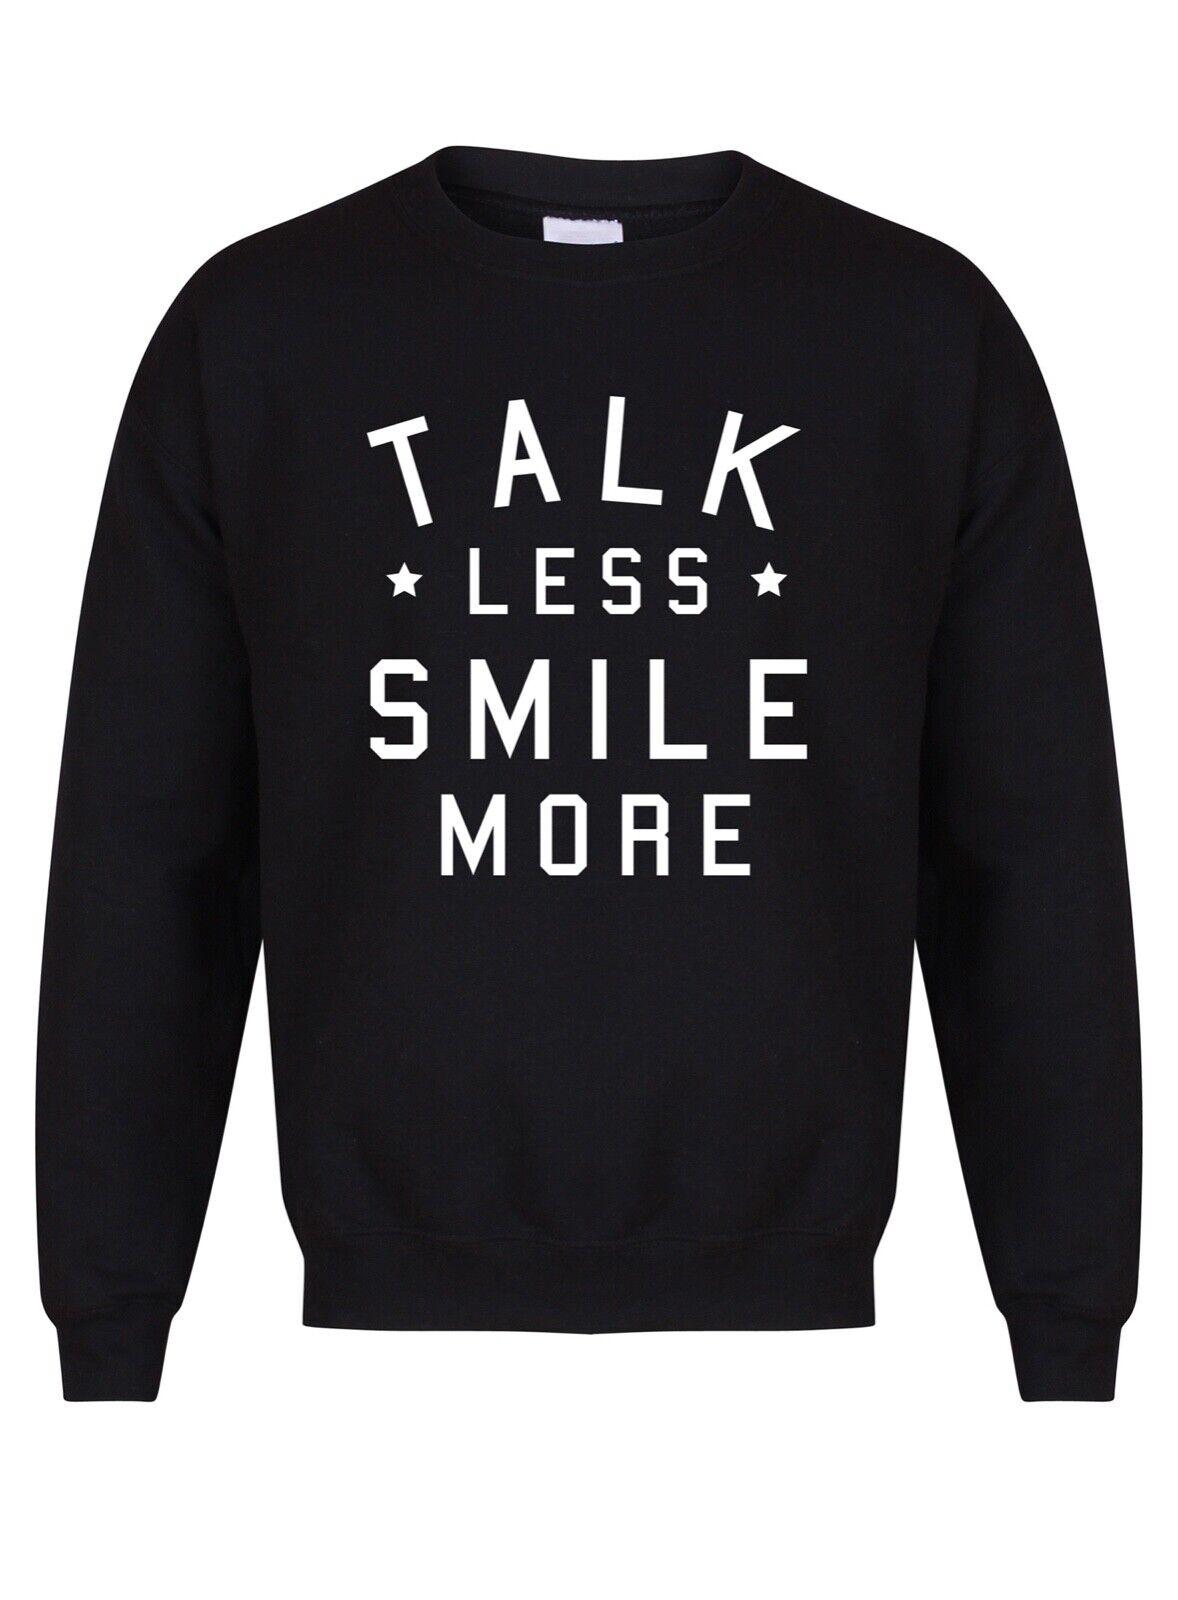 Talk less Smile More-Unisex Jumper-Hamilton Schuyler Musical Jumper